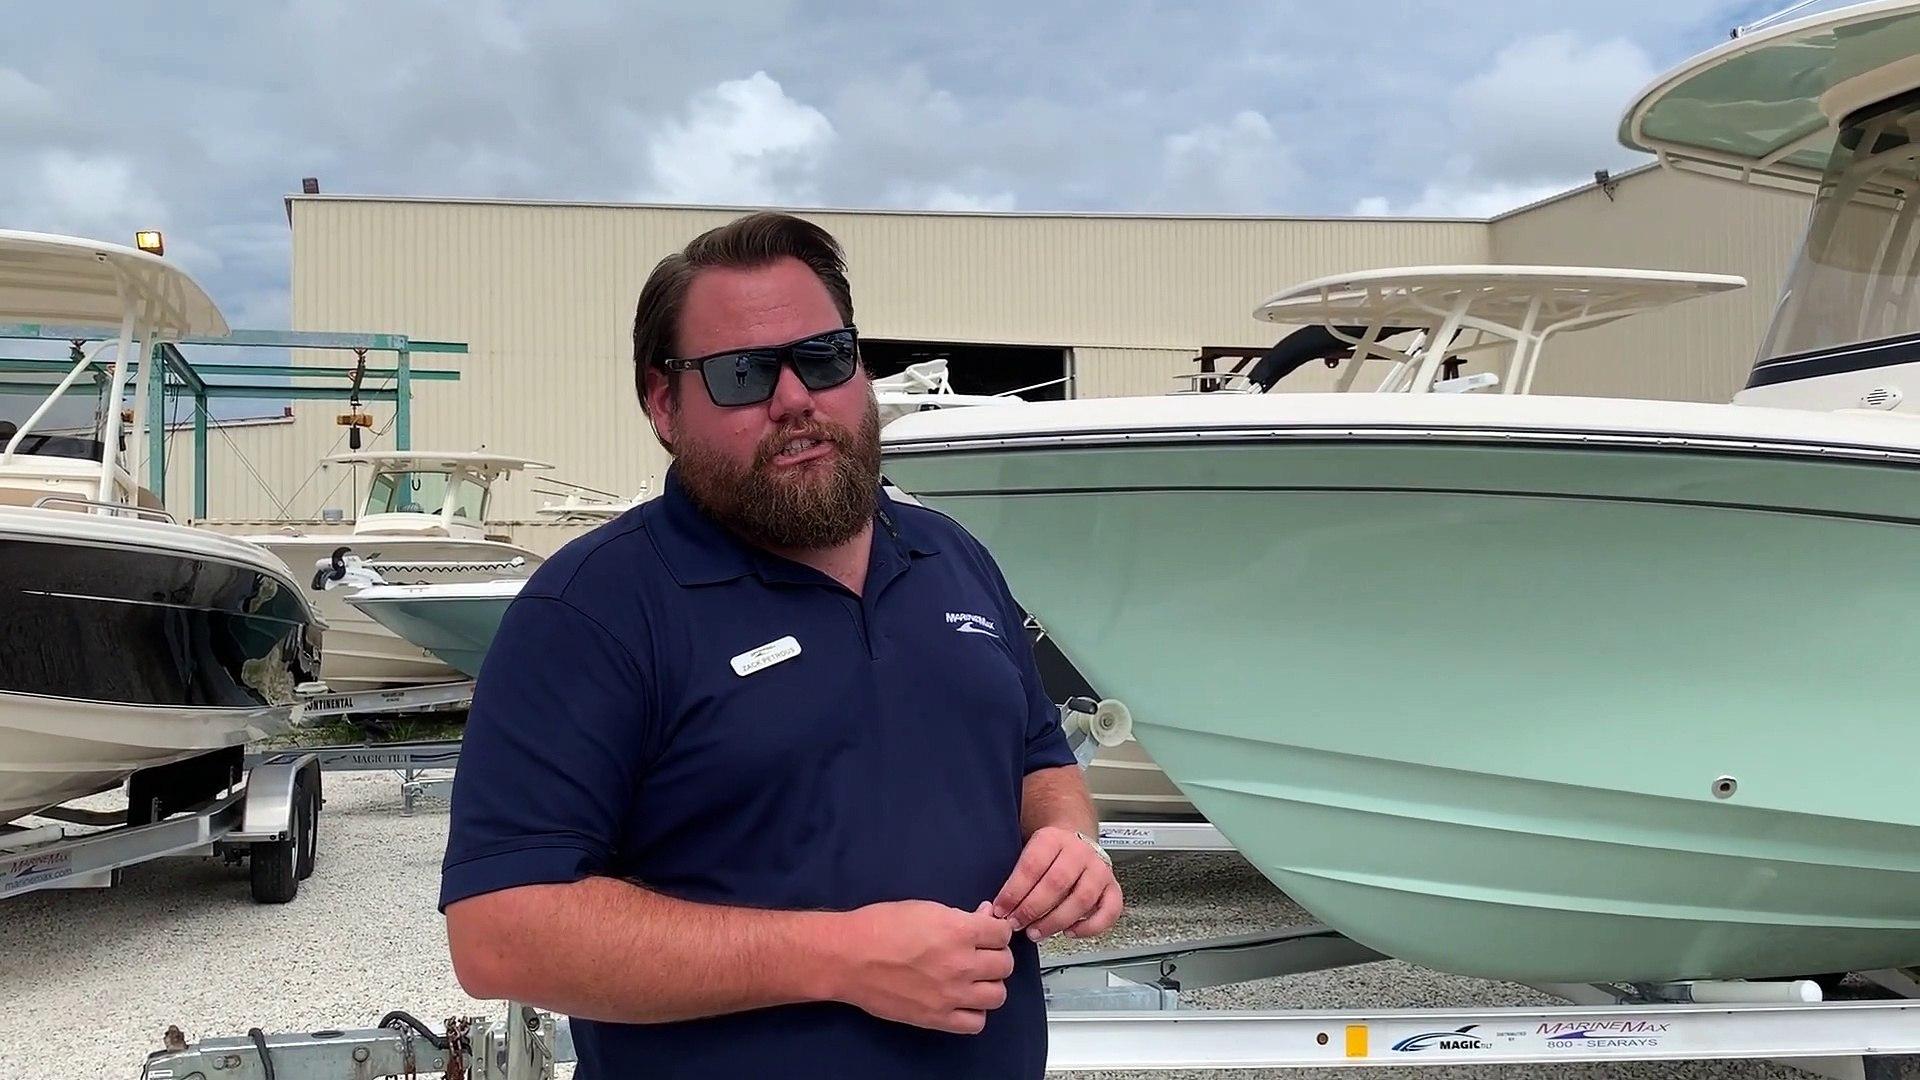 2019 Grady-White Fisherman 216 For Sale in Jacksonville Beach